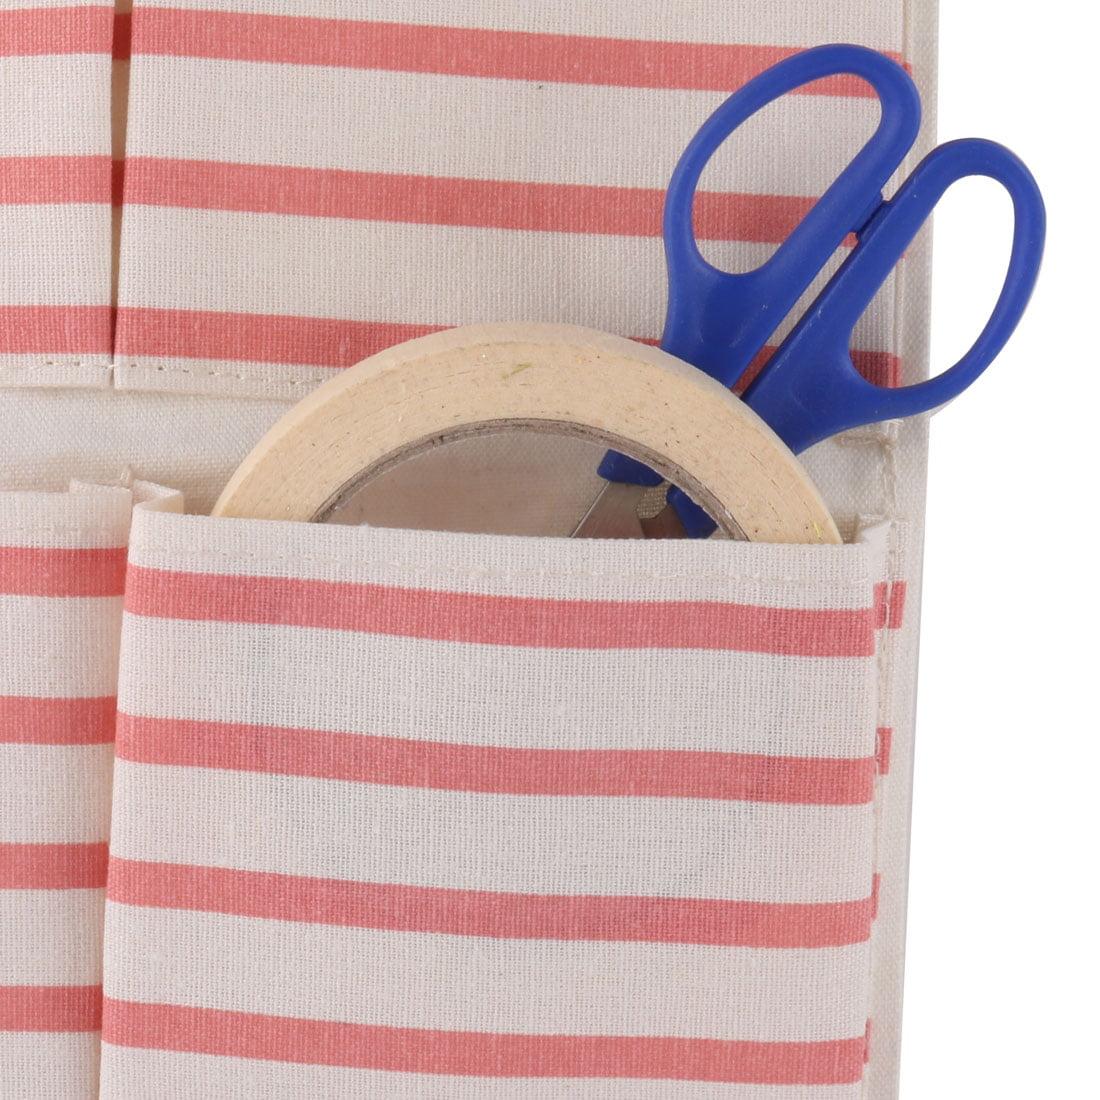 Dormitory Wall Stripe Print 6 Pockets Sundry Key Holder Hanging Bag Case Pink - image 2 of 4